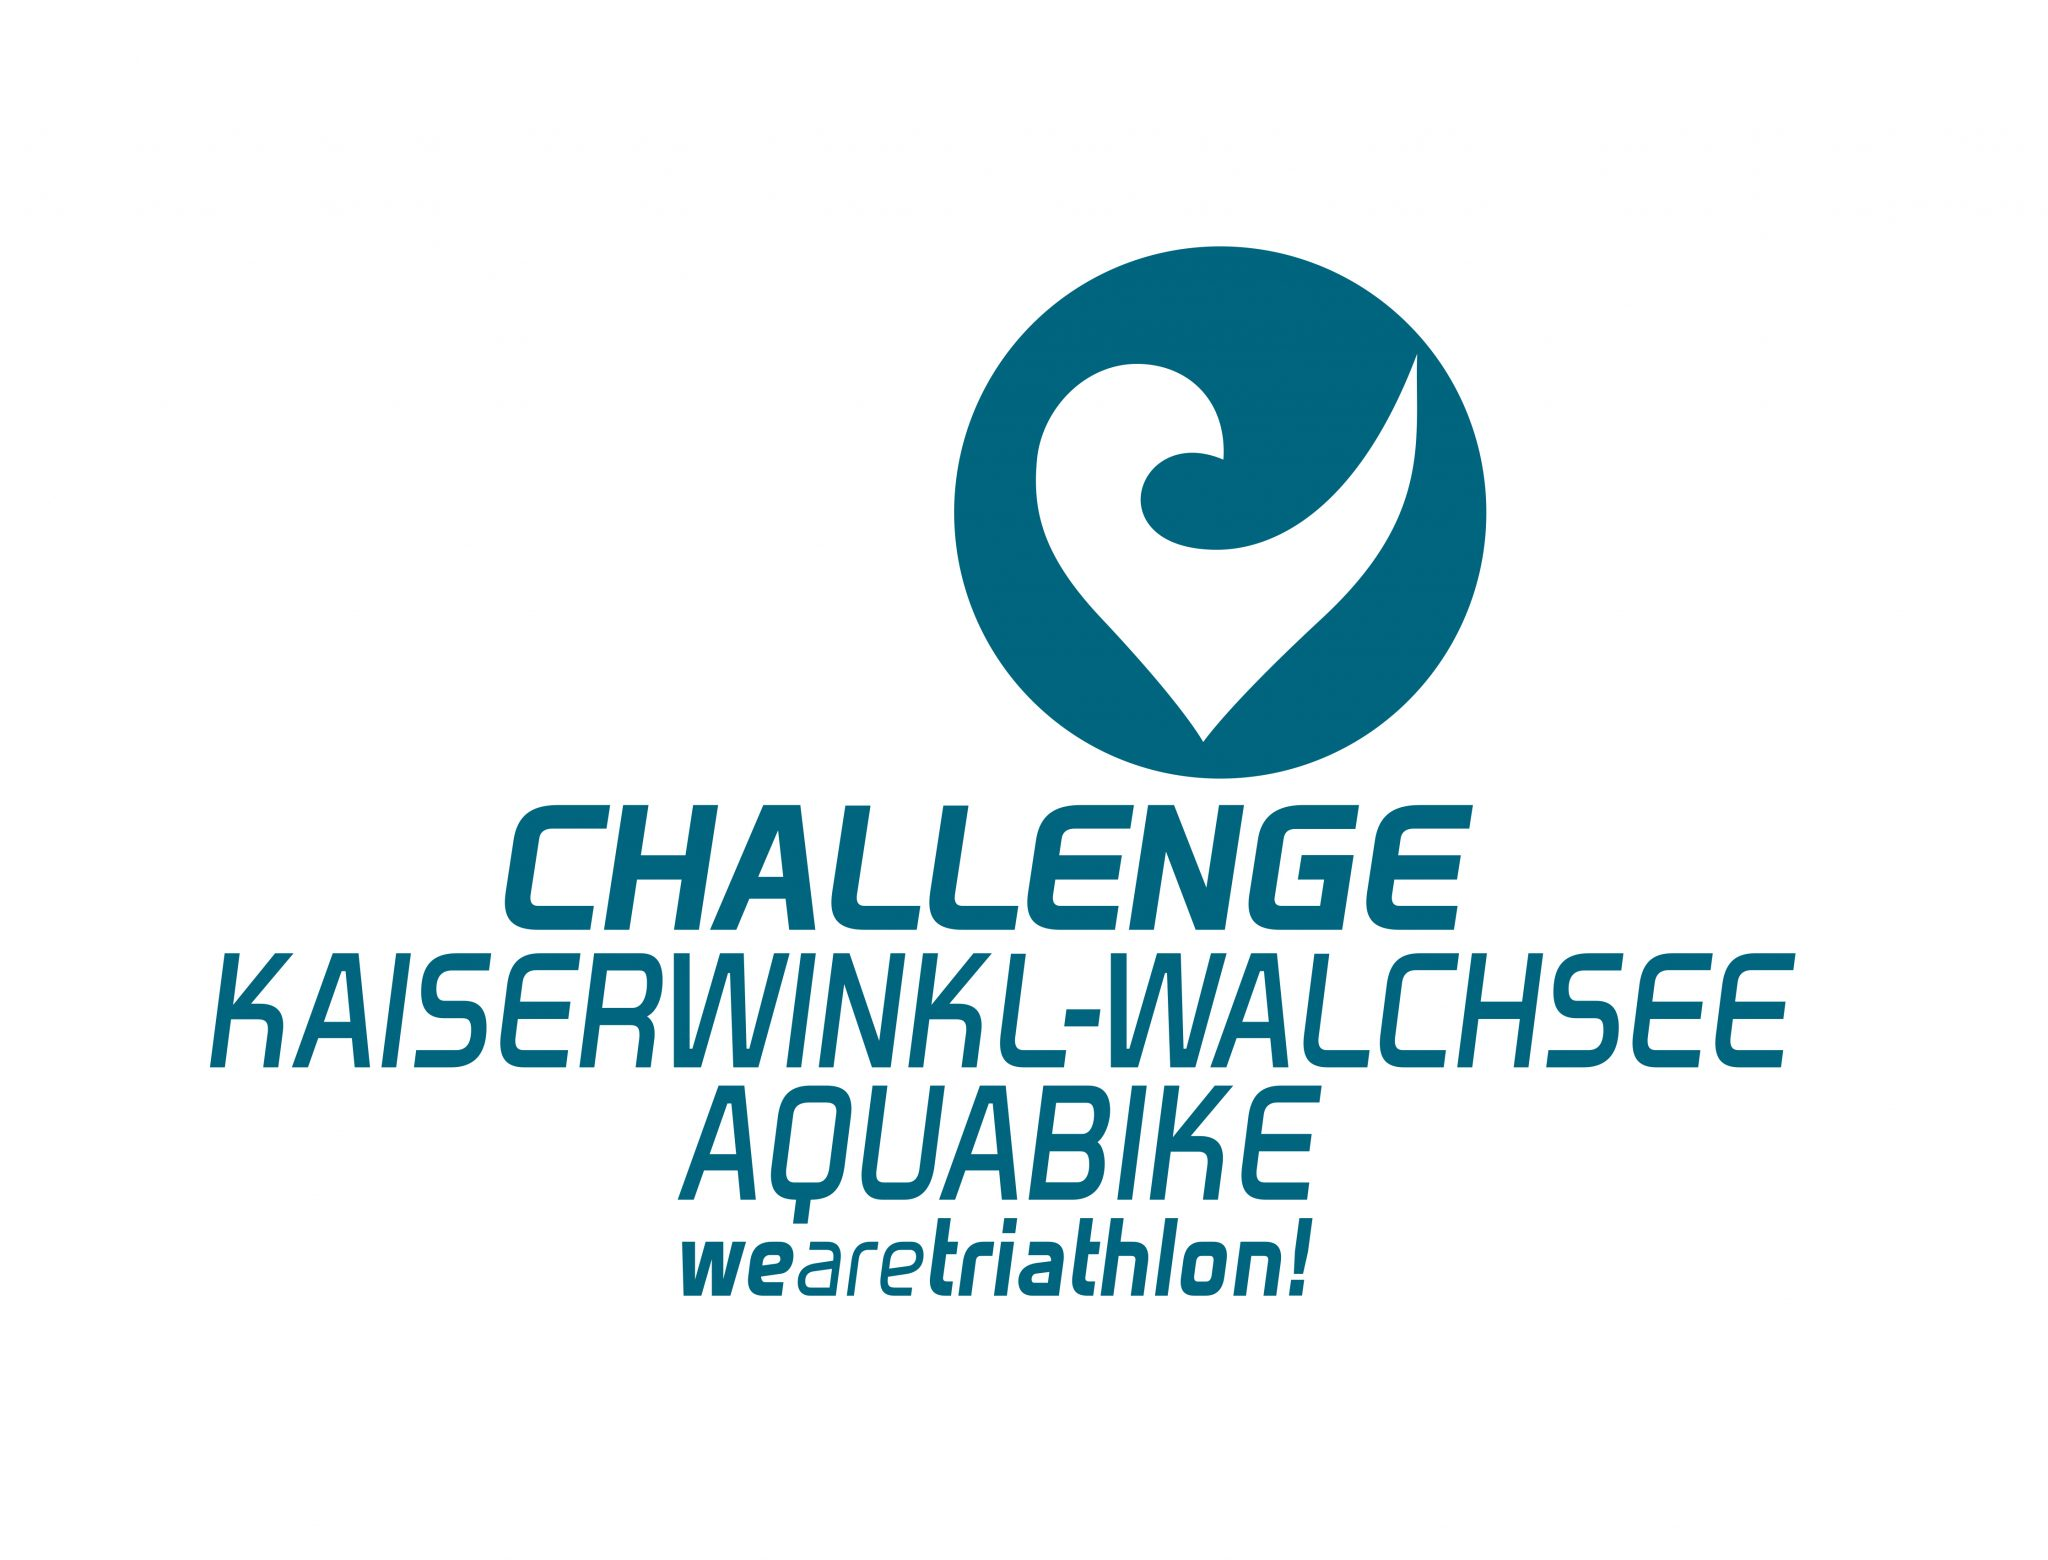 Challenge Kaiserwinkl-Walchsee Aquabike